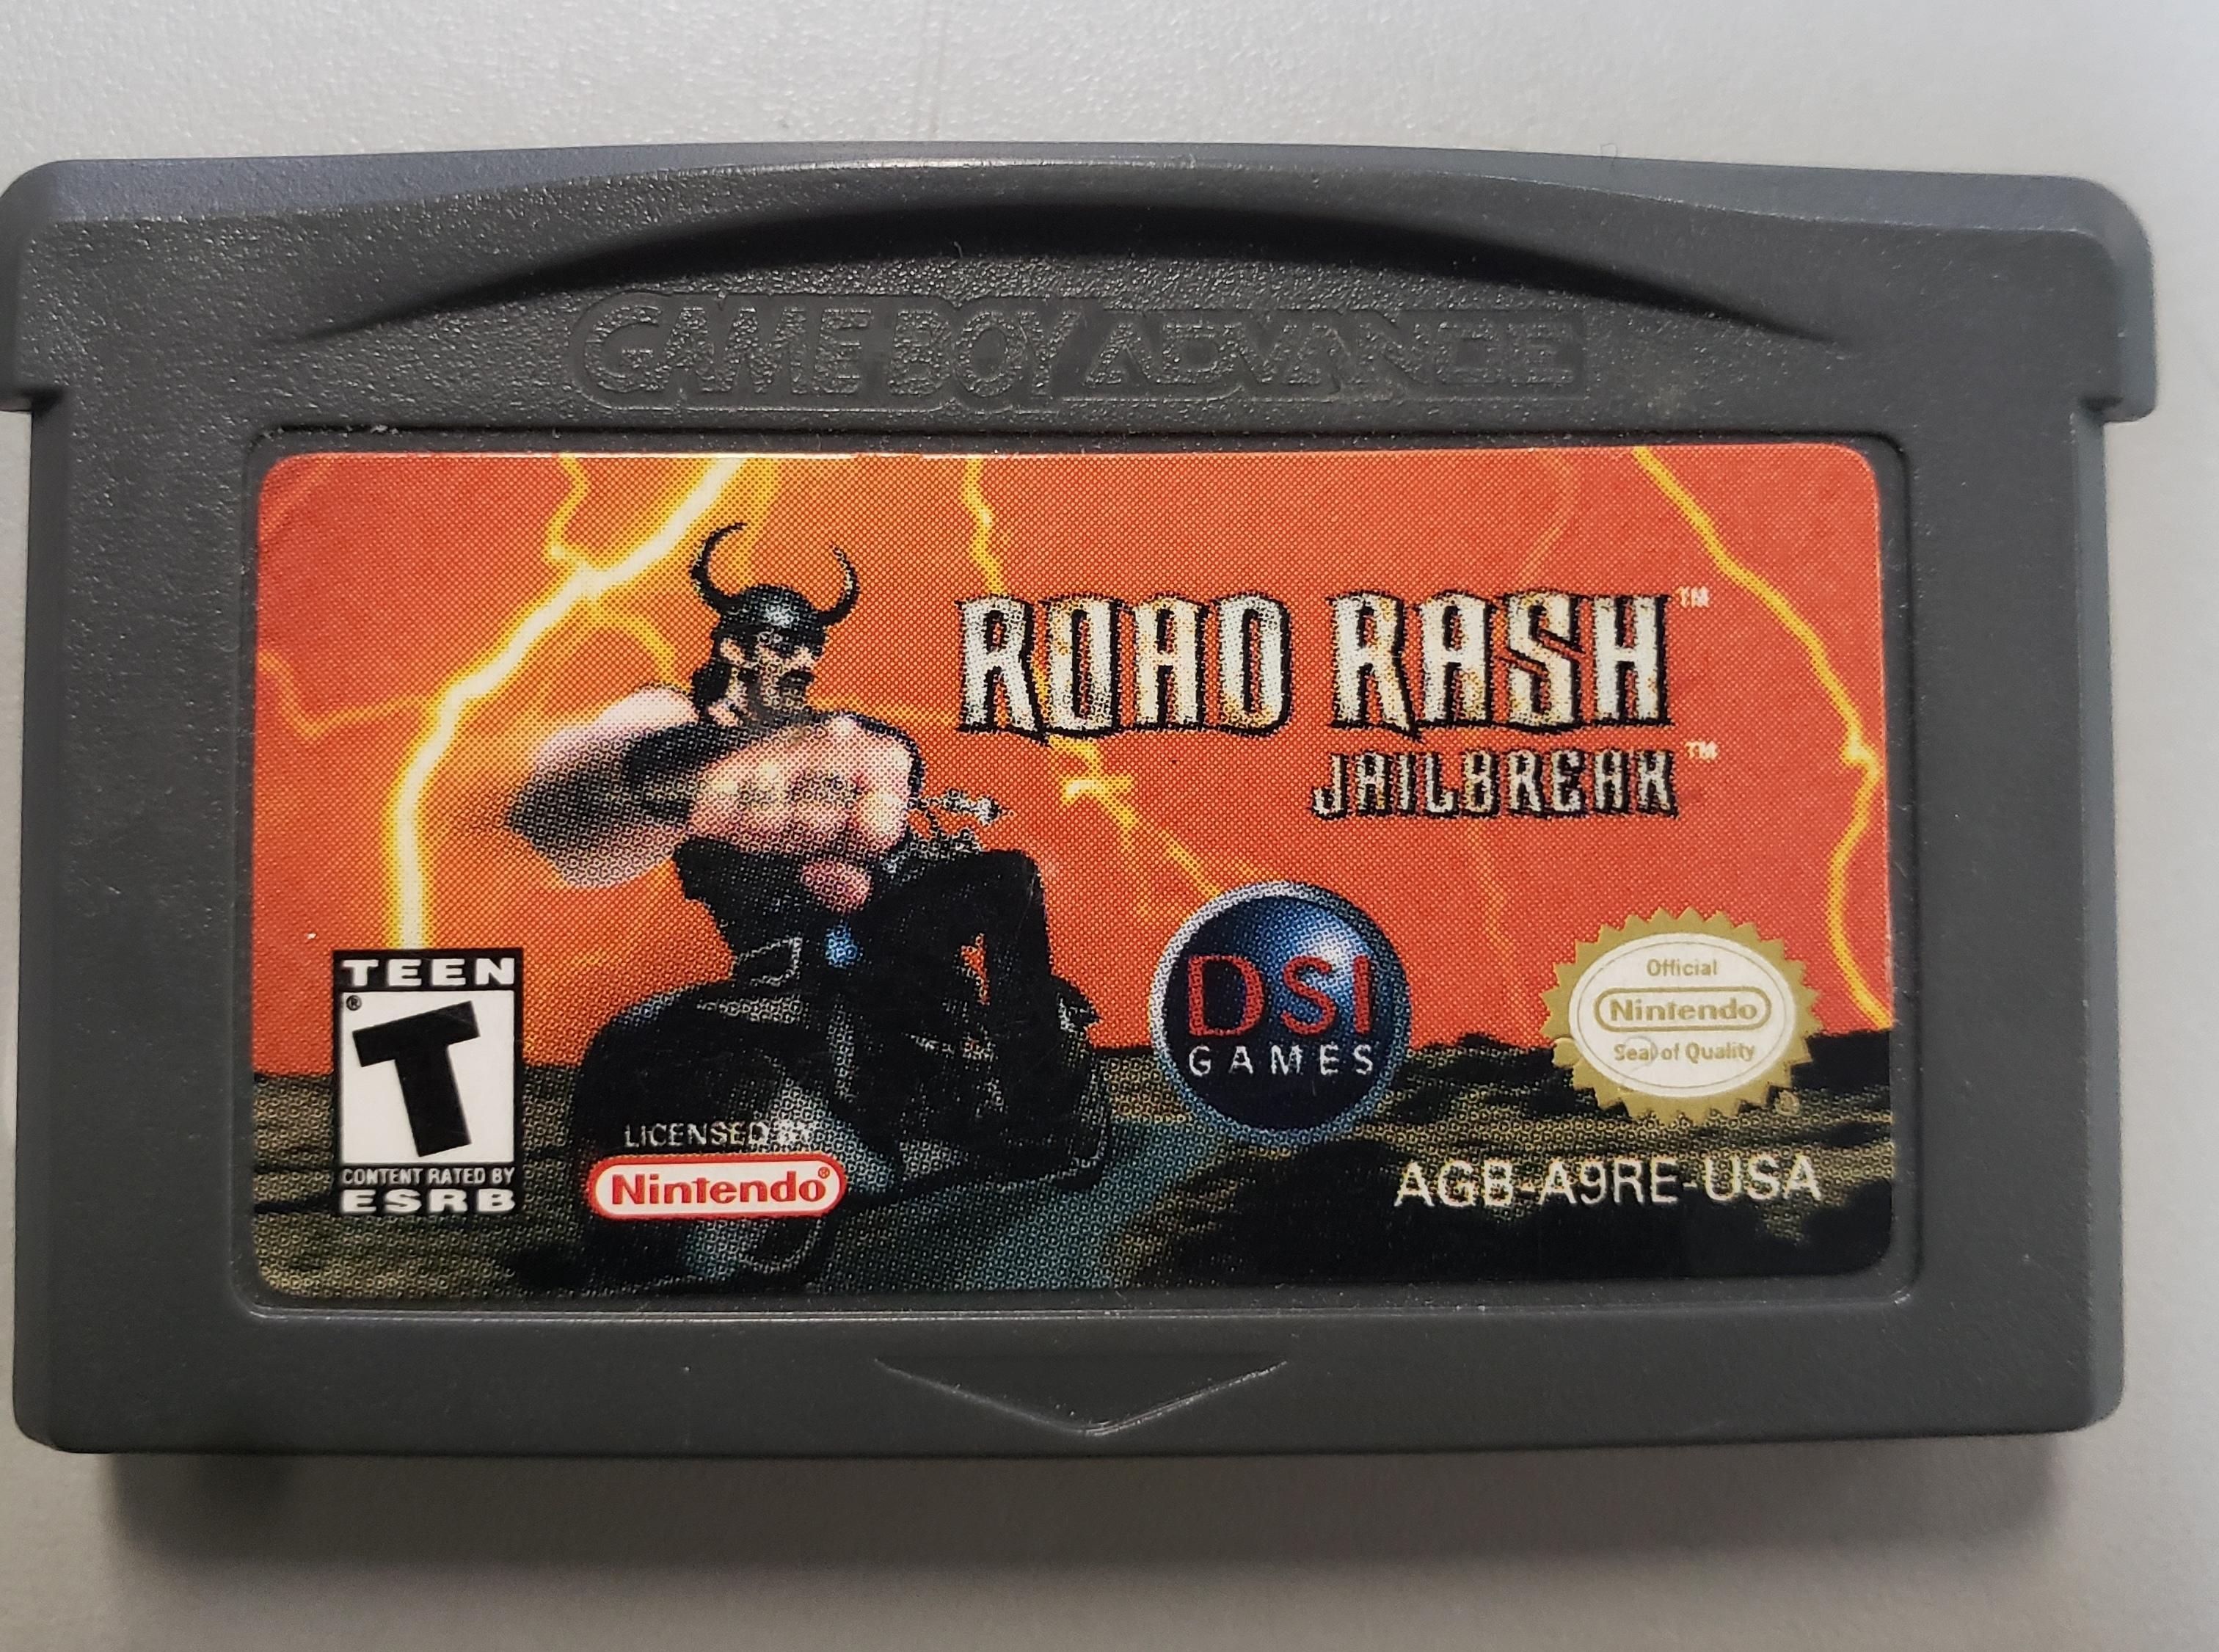 ROAD RASH JAILBREAK - GAMEBOY ADVANCE GAME